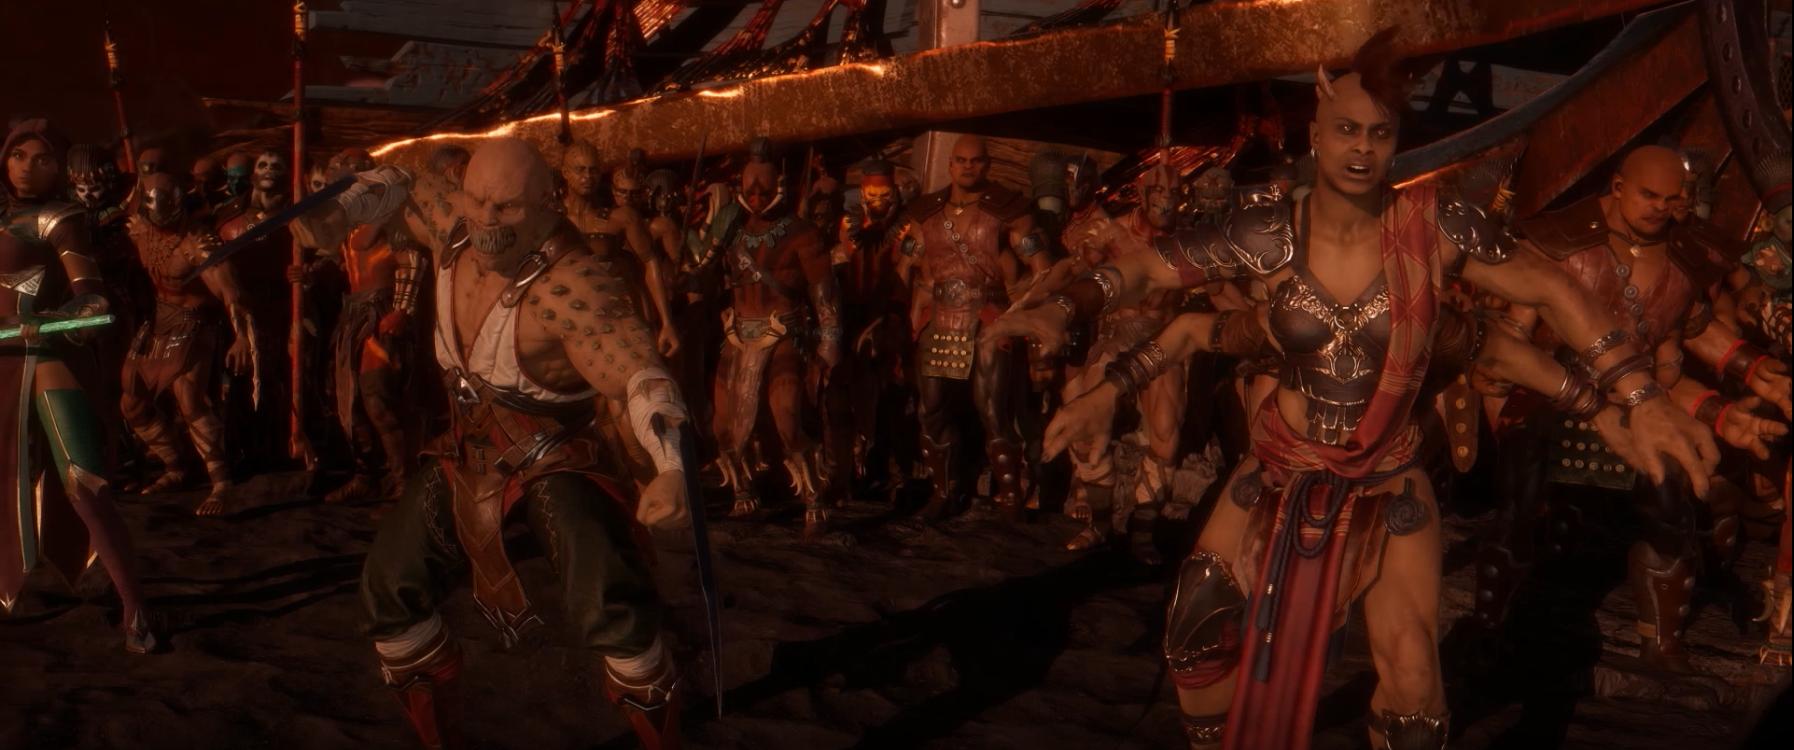 Data-Mining Reveals Possible Mortal Kombat 11 DLC - Mortal Kombat Online